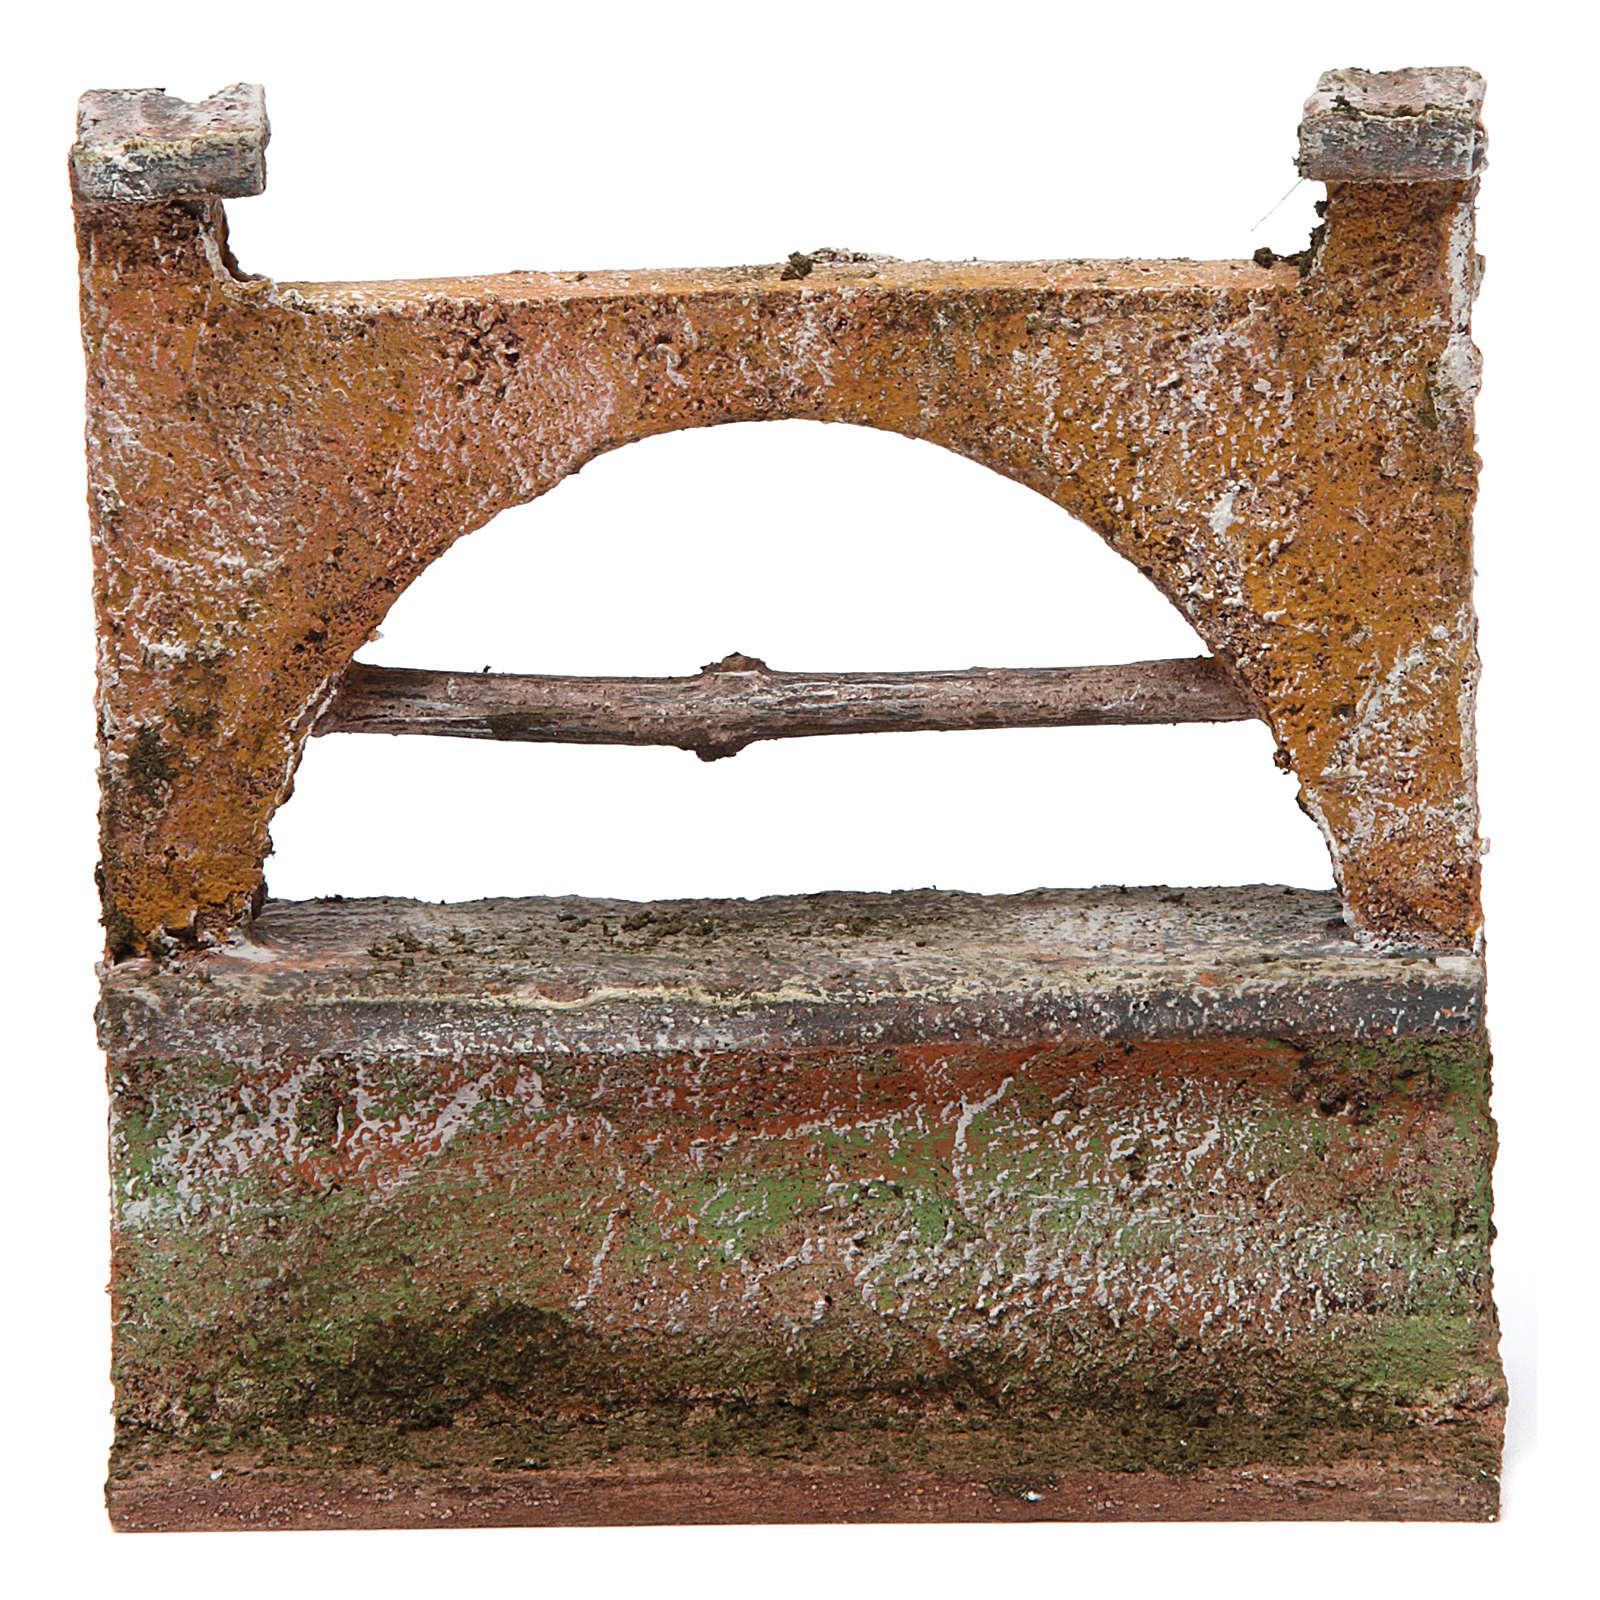 Muretto arco per presepe 12 cm 15x5x10 cm 4